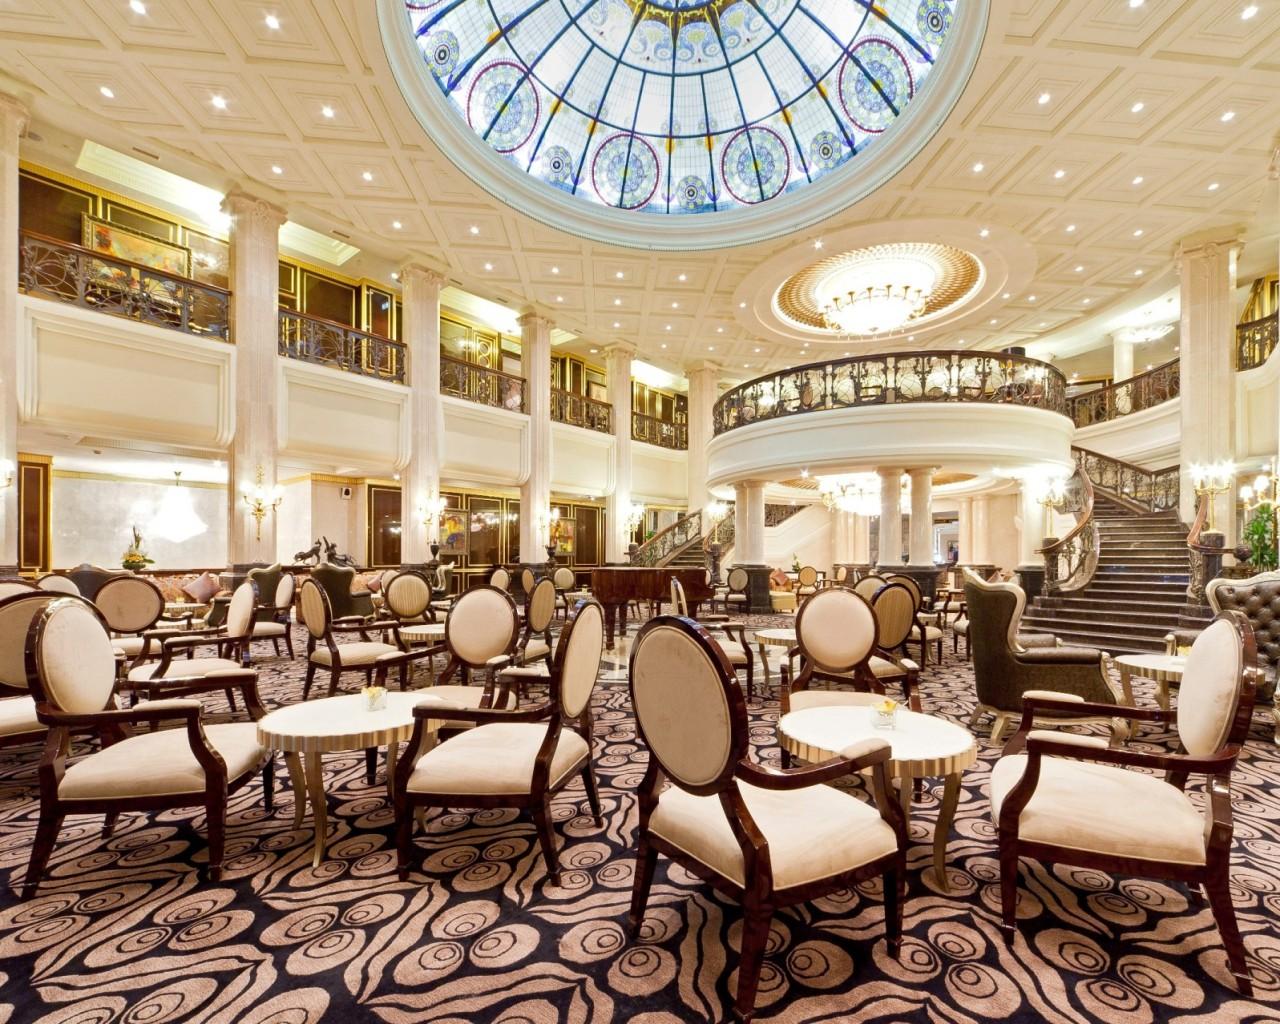 The Hotel Nikol'skaya Kempinski Moscow has just undergone a six-year renovation.